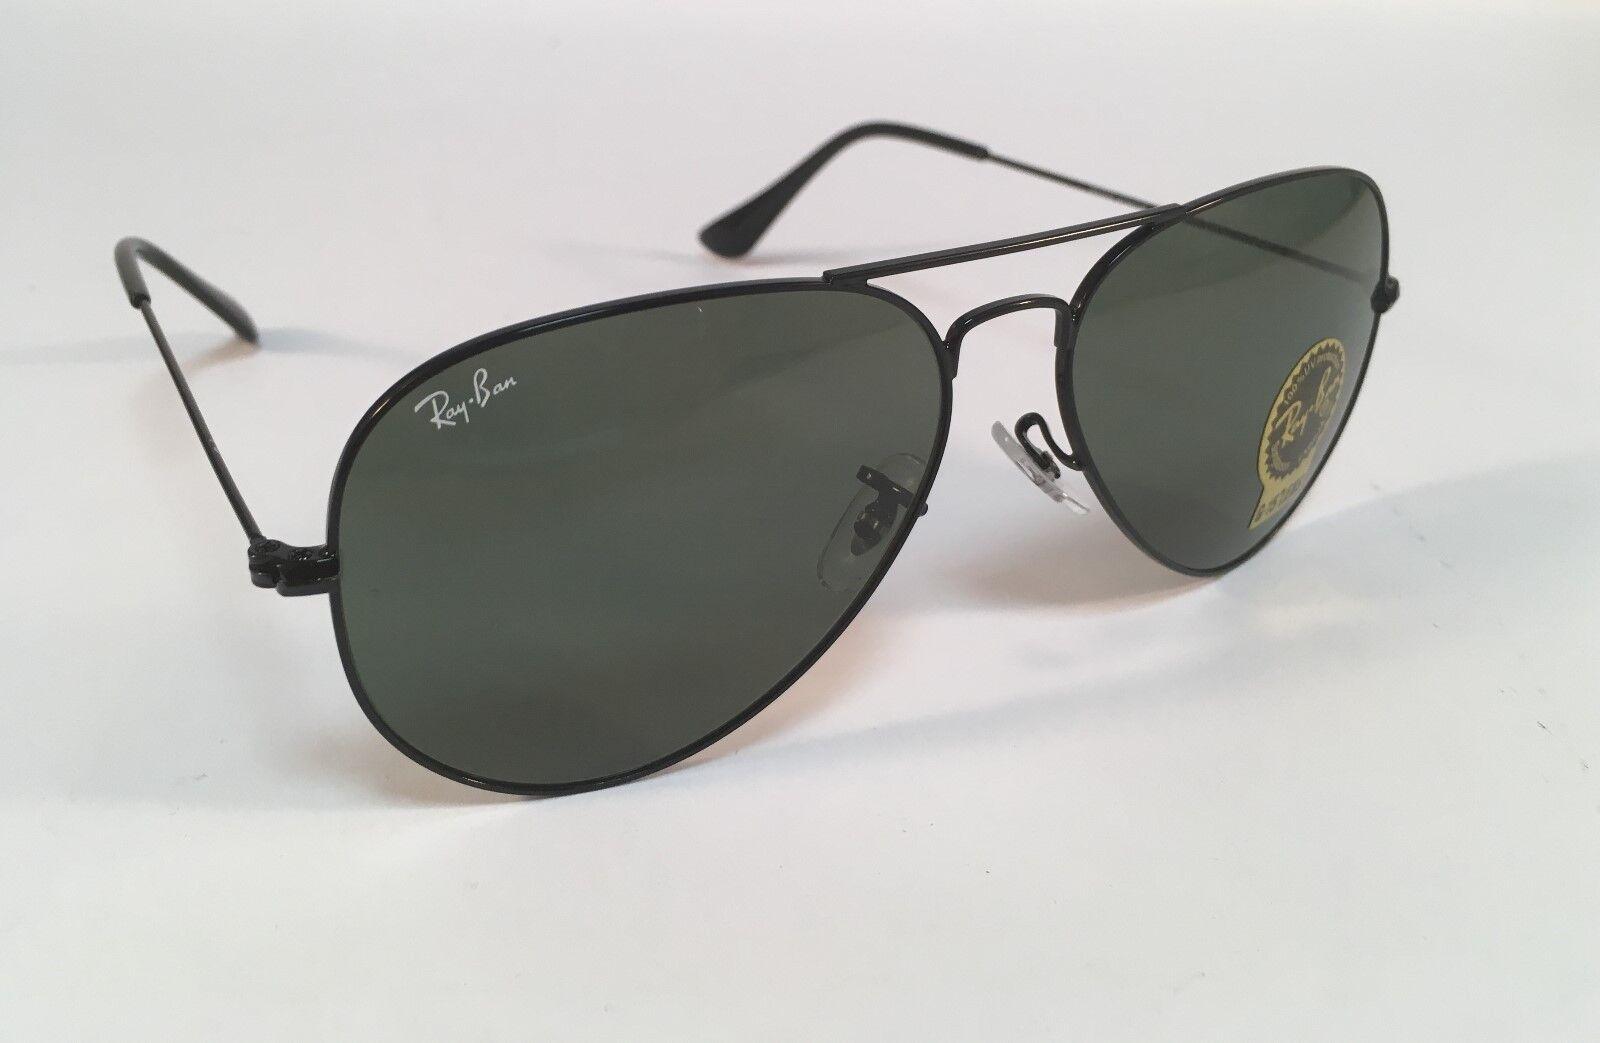 922013d5407 Ray-Ban Aviator RB3025 L2823 58mm Green Lens Black Frame Sunglasses ...